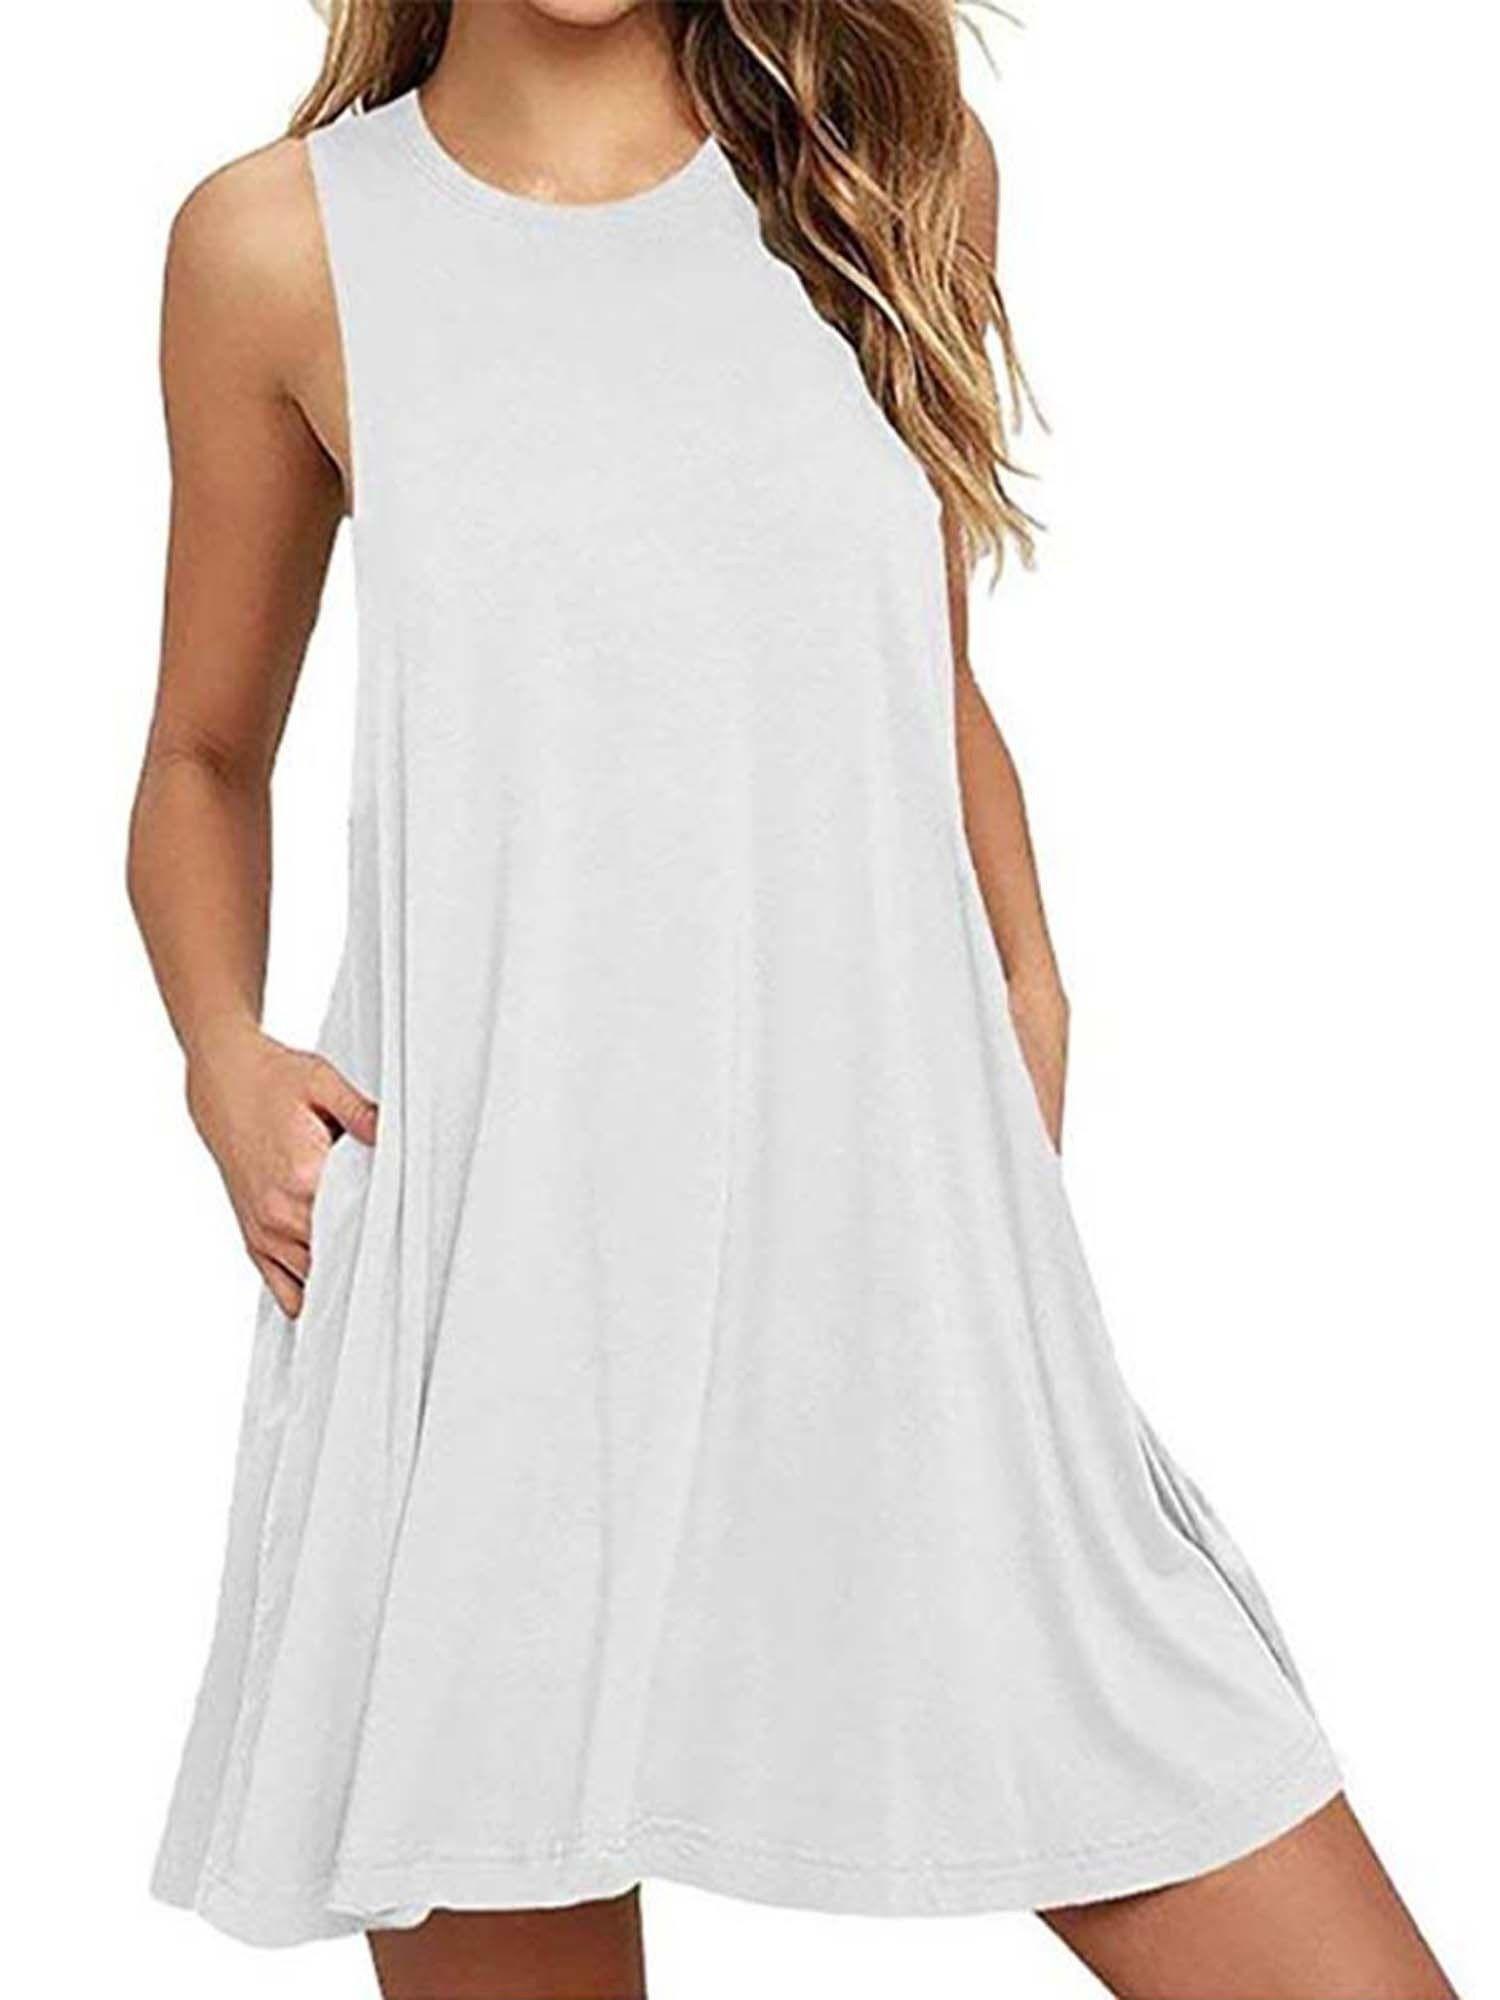 Wodstyle Women S Plus Size Sleeveless Swing Mini Dresses Summer Beach A Line Sundress Walmart Com Casual Summer Dresses Cotton Tank Dress Mini Shirt Dress [ 2000 x 1500 Pixel ]